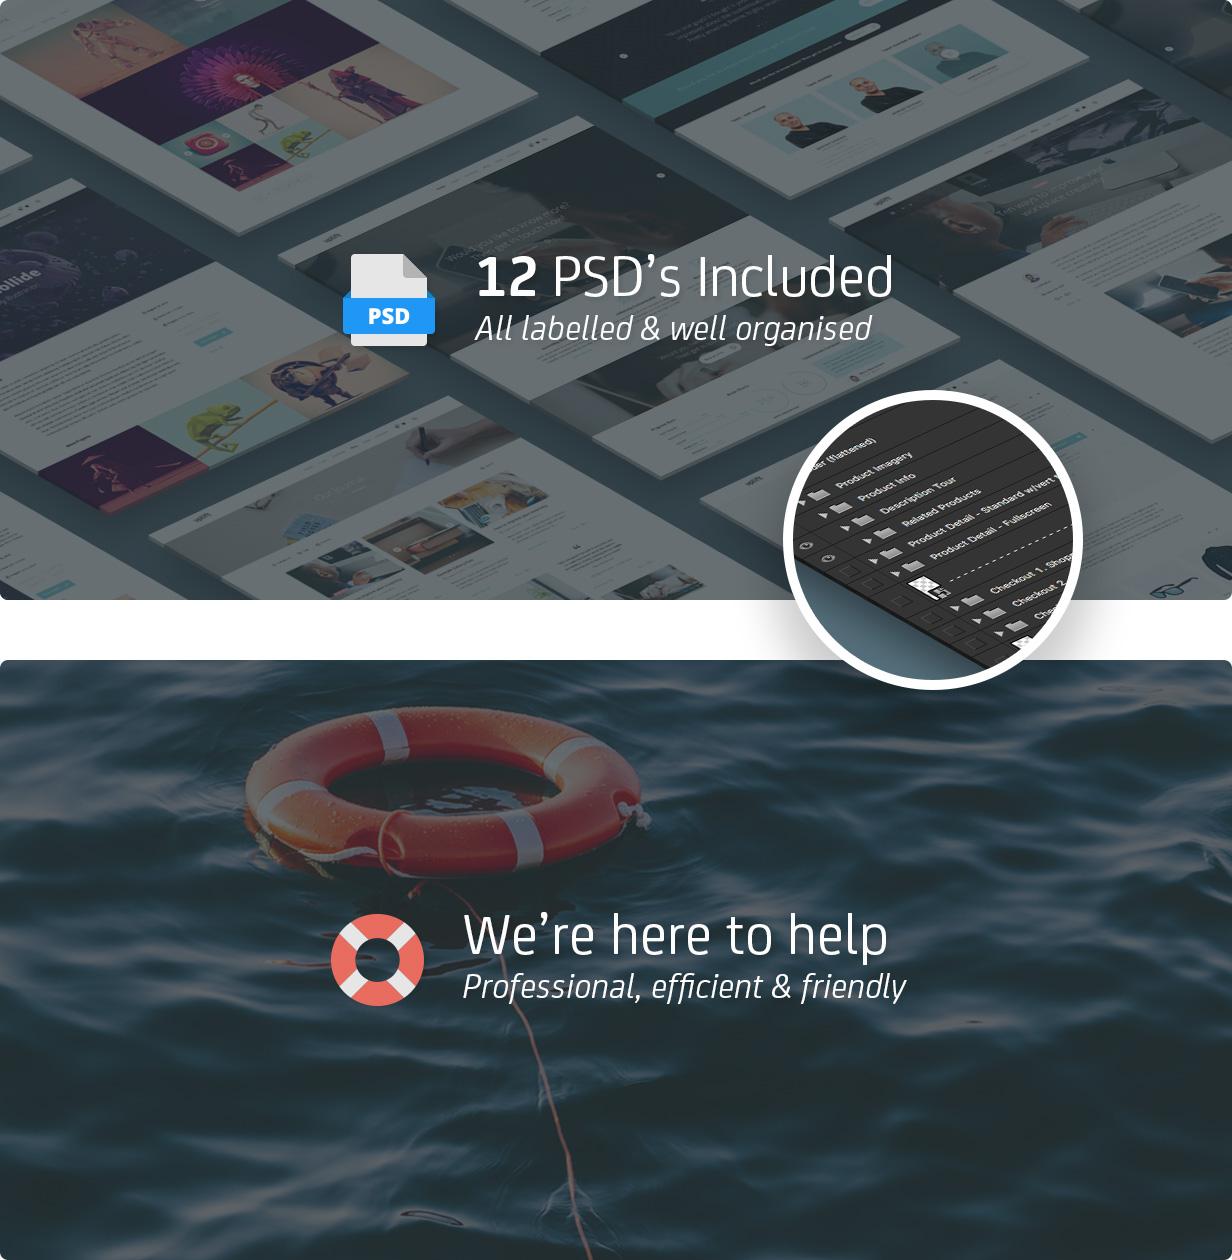 22 psds support - Uplift - Responsive Multi-Purpose WordPress Theme